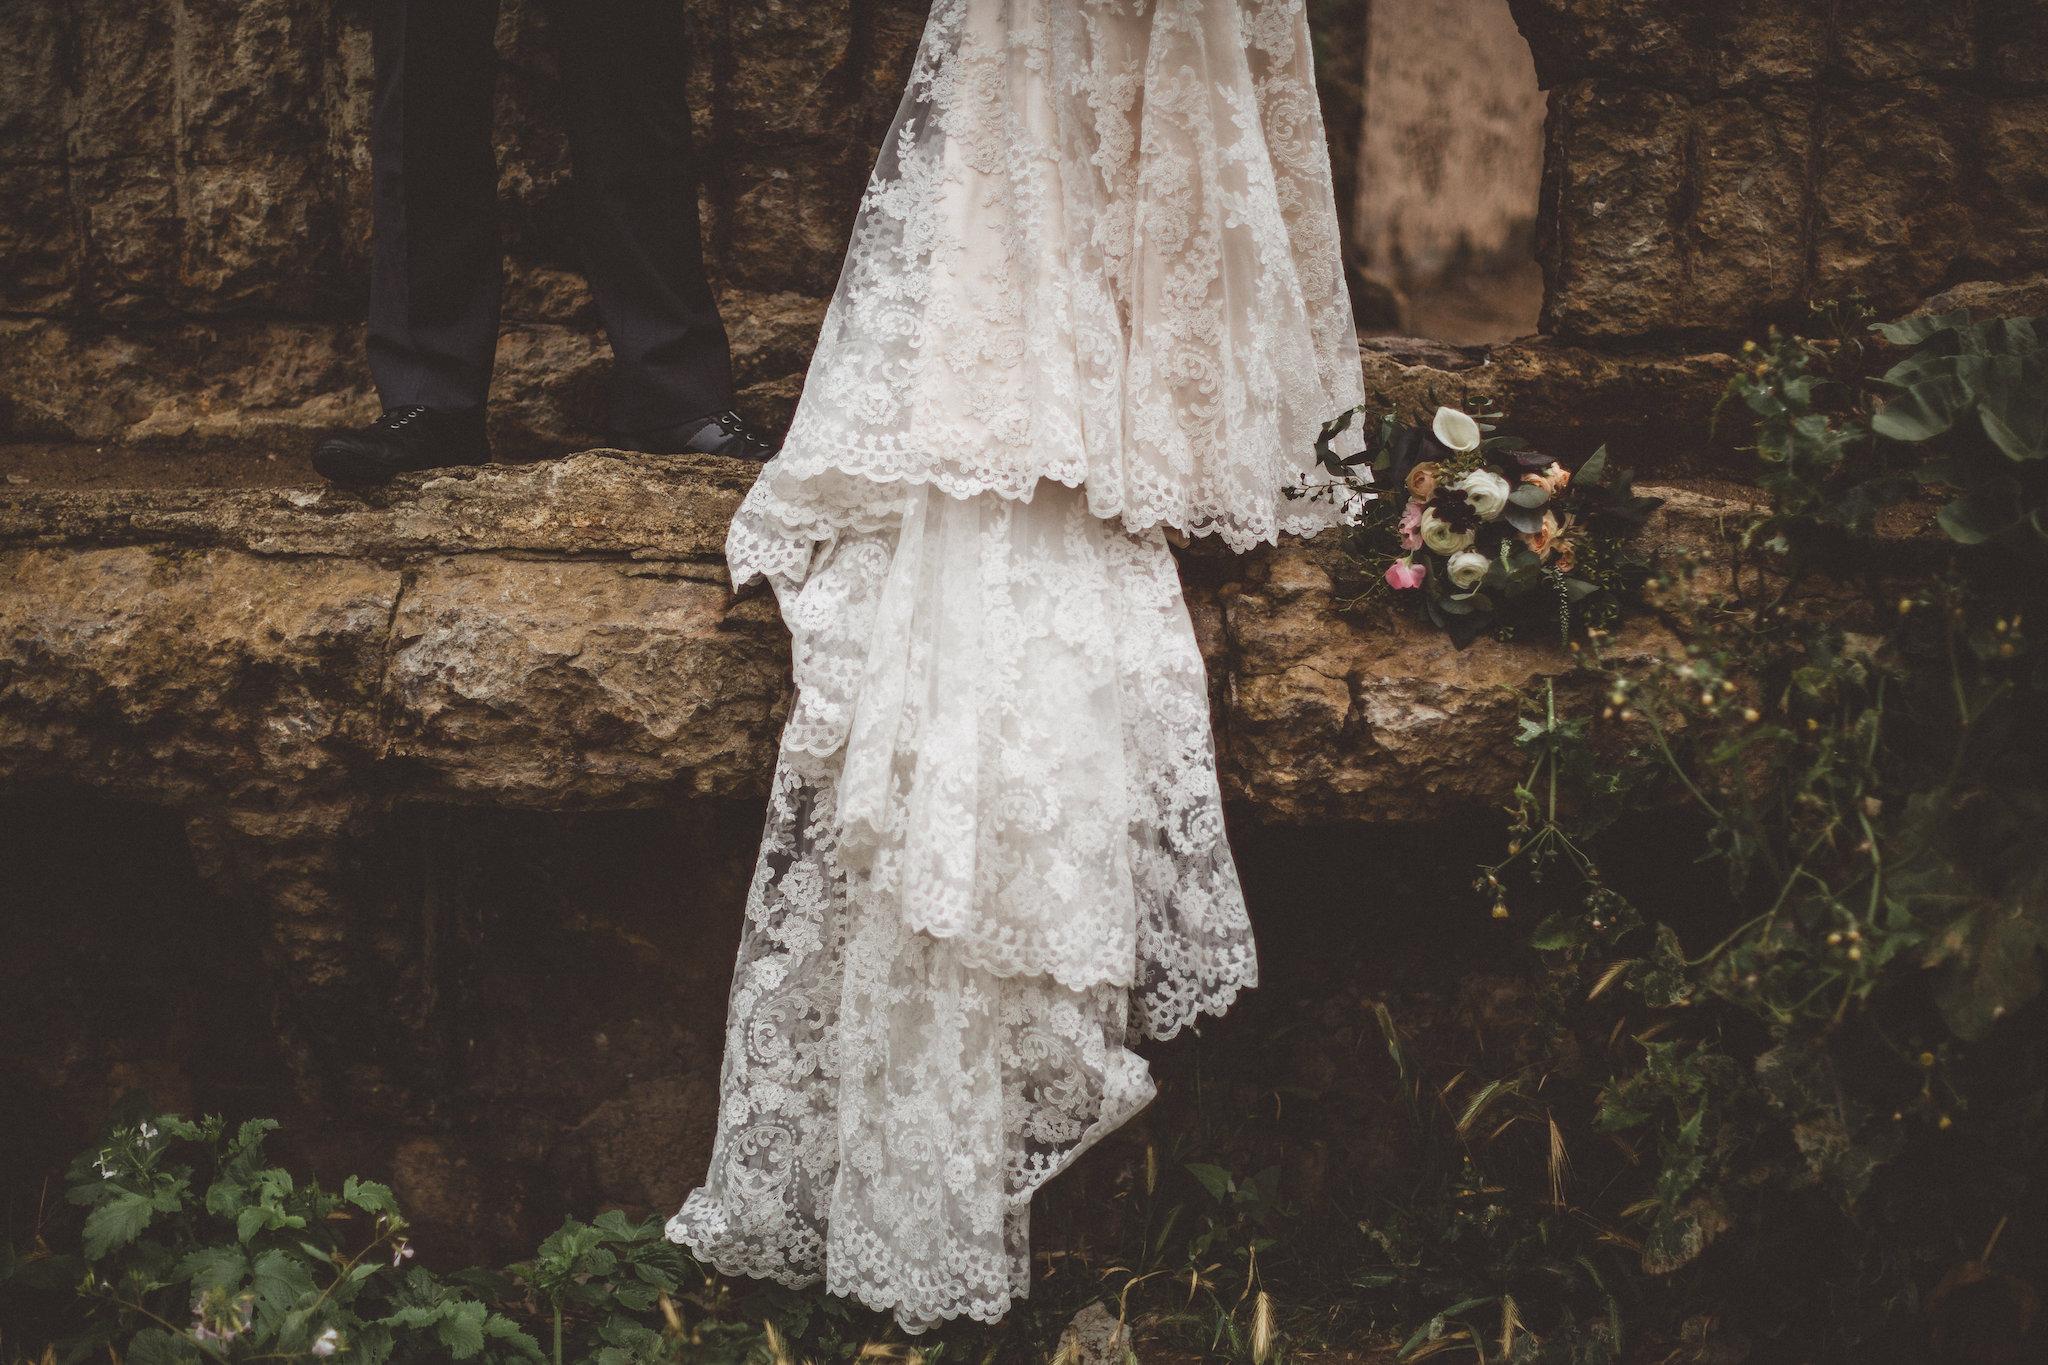 kris-and-andreas-san-francisco-elopement-adventure63.jpg